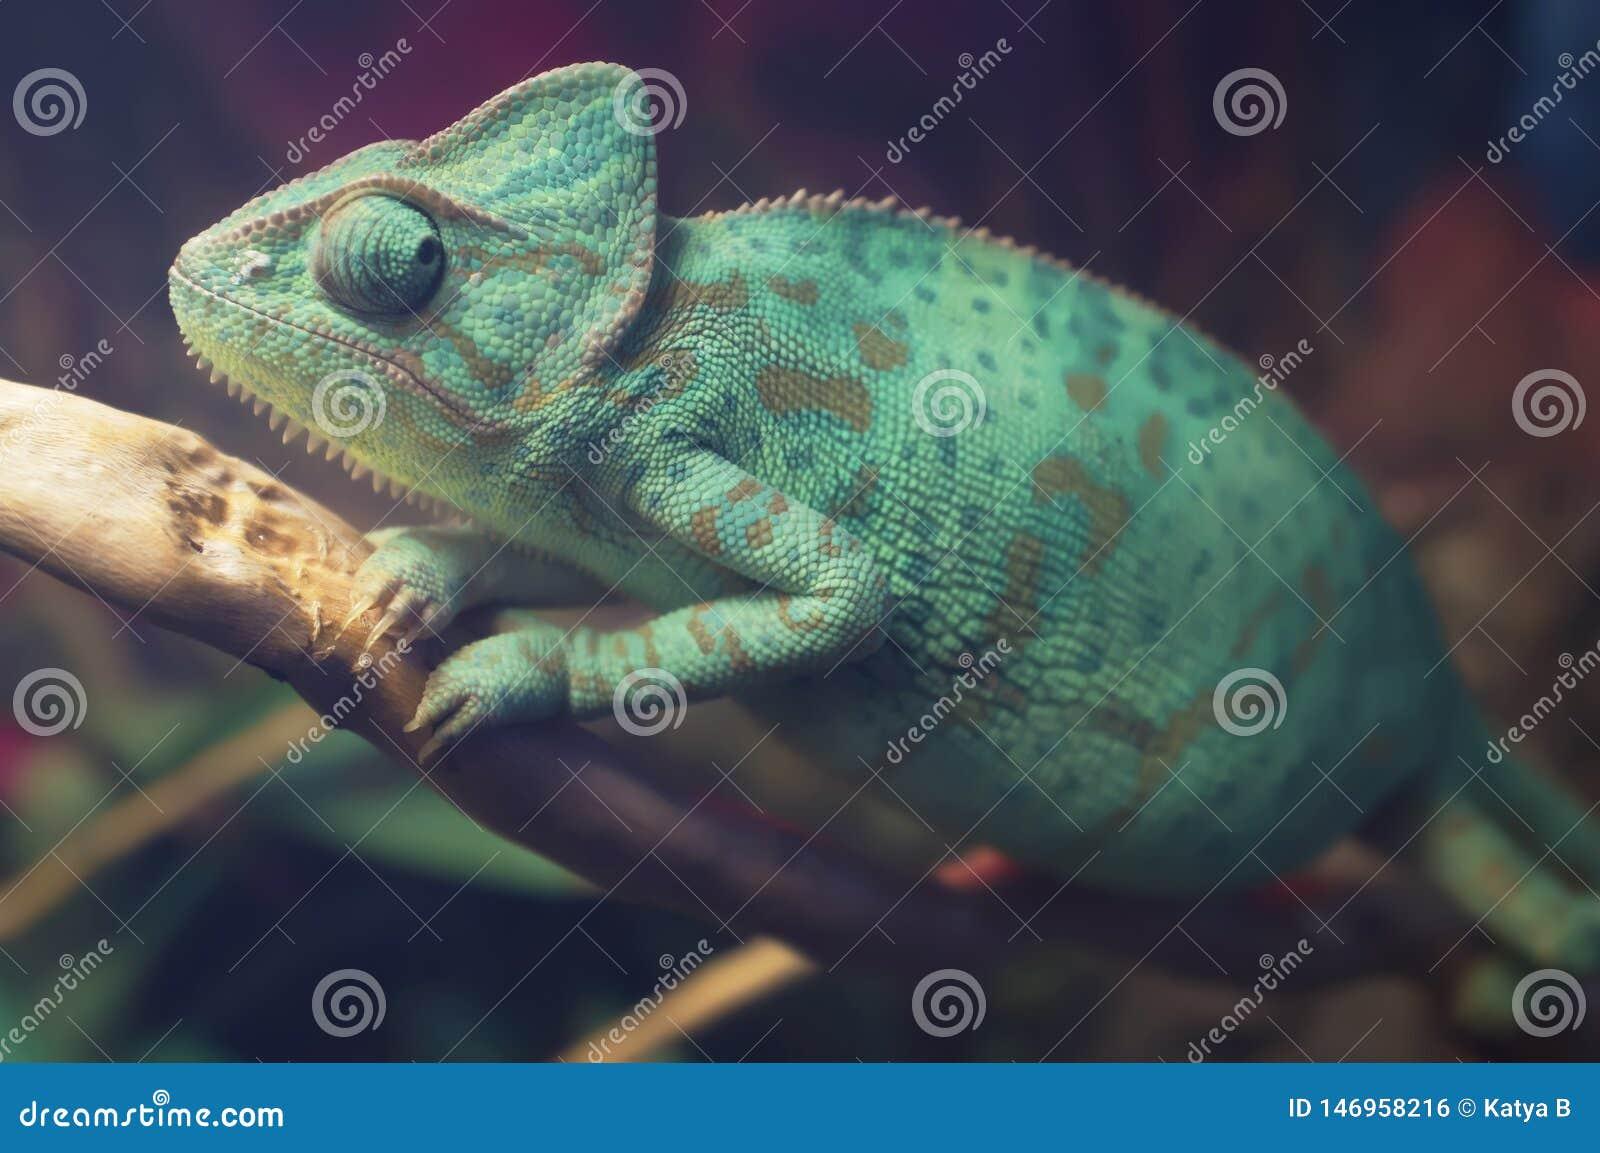 Bright Blue Spotted Chameleon Sitting On The Branch Veiled Chameleon Chamaeleo Calyptratus In Terrarium Close Up Stock Photo Image Of Chamaeleonidae Moscow 146958216